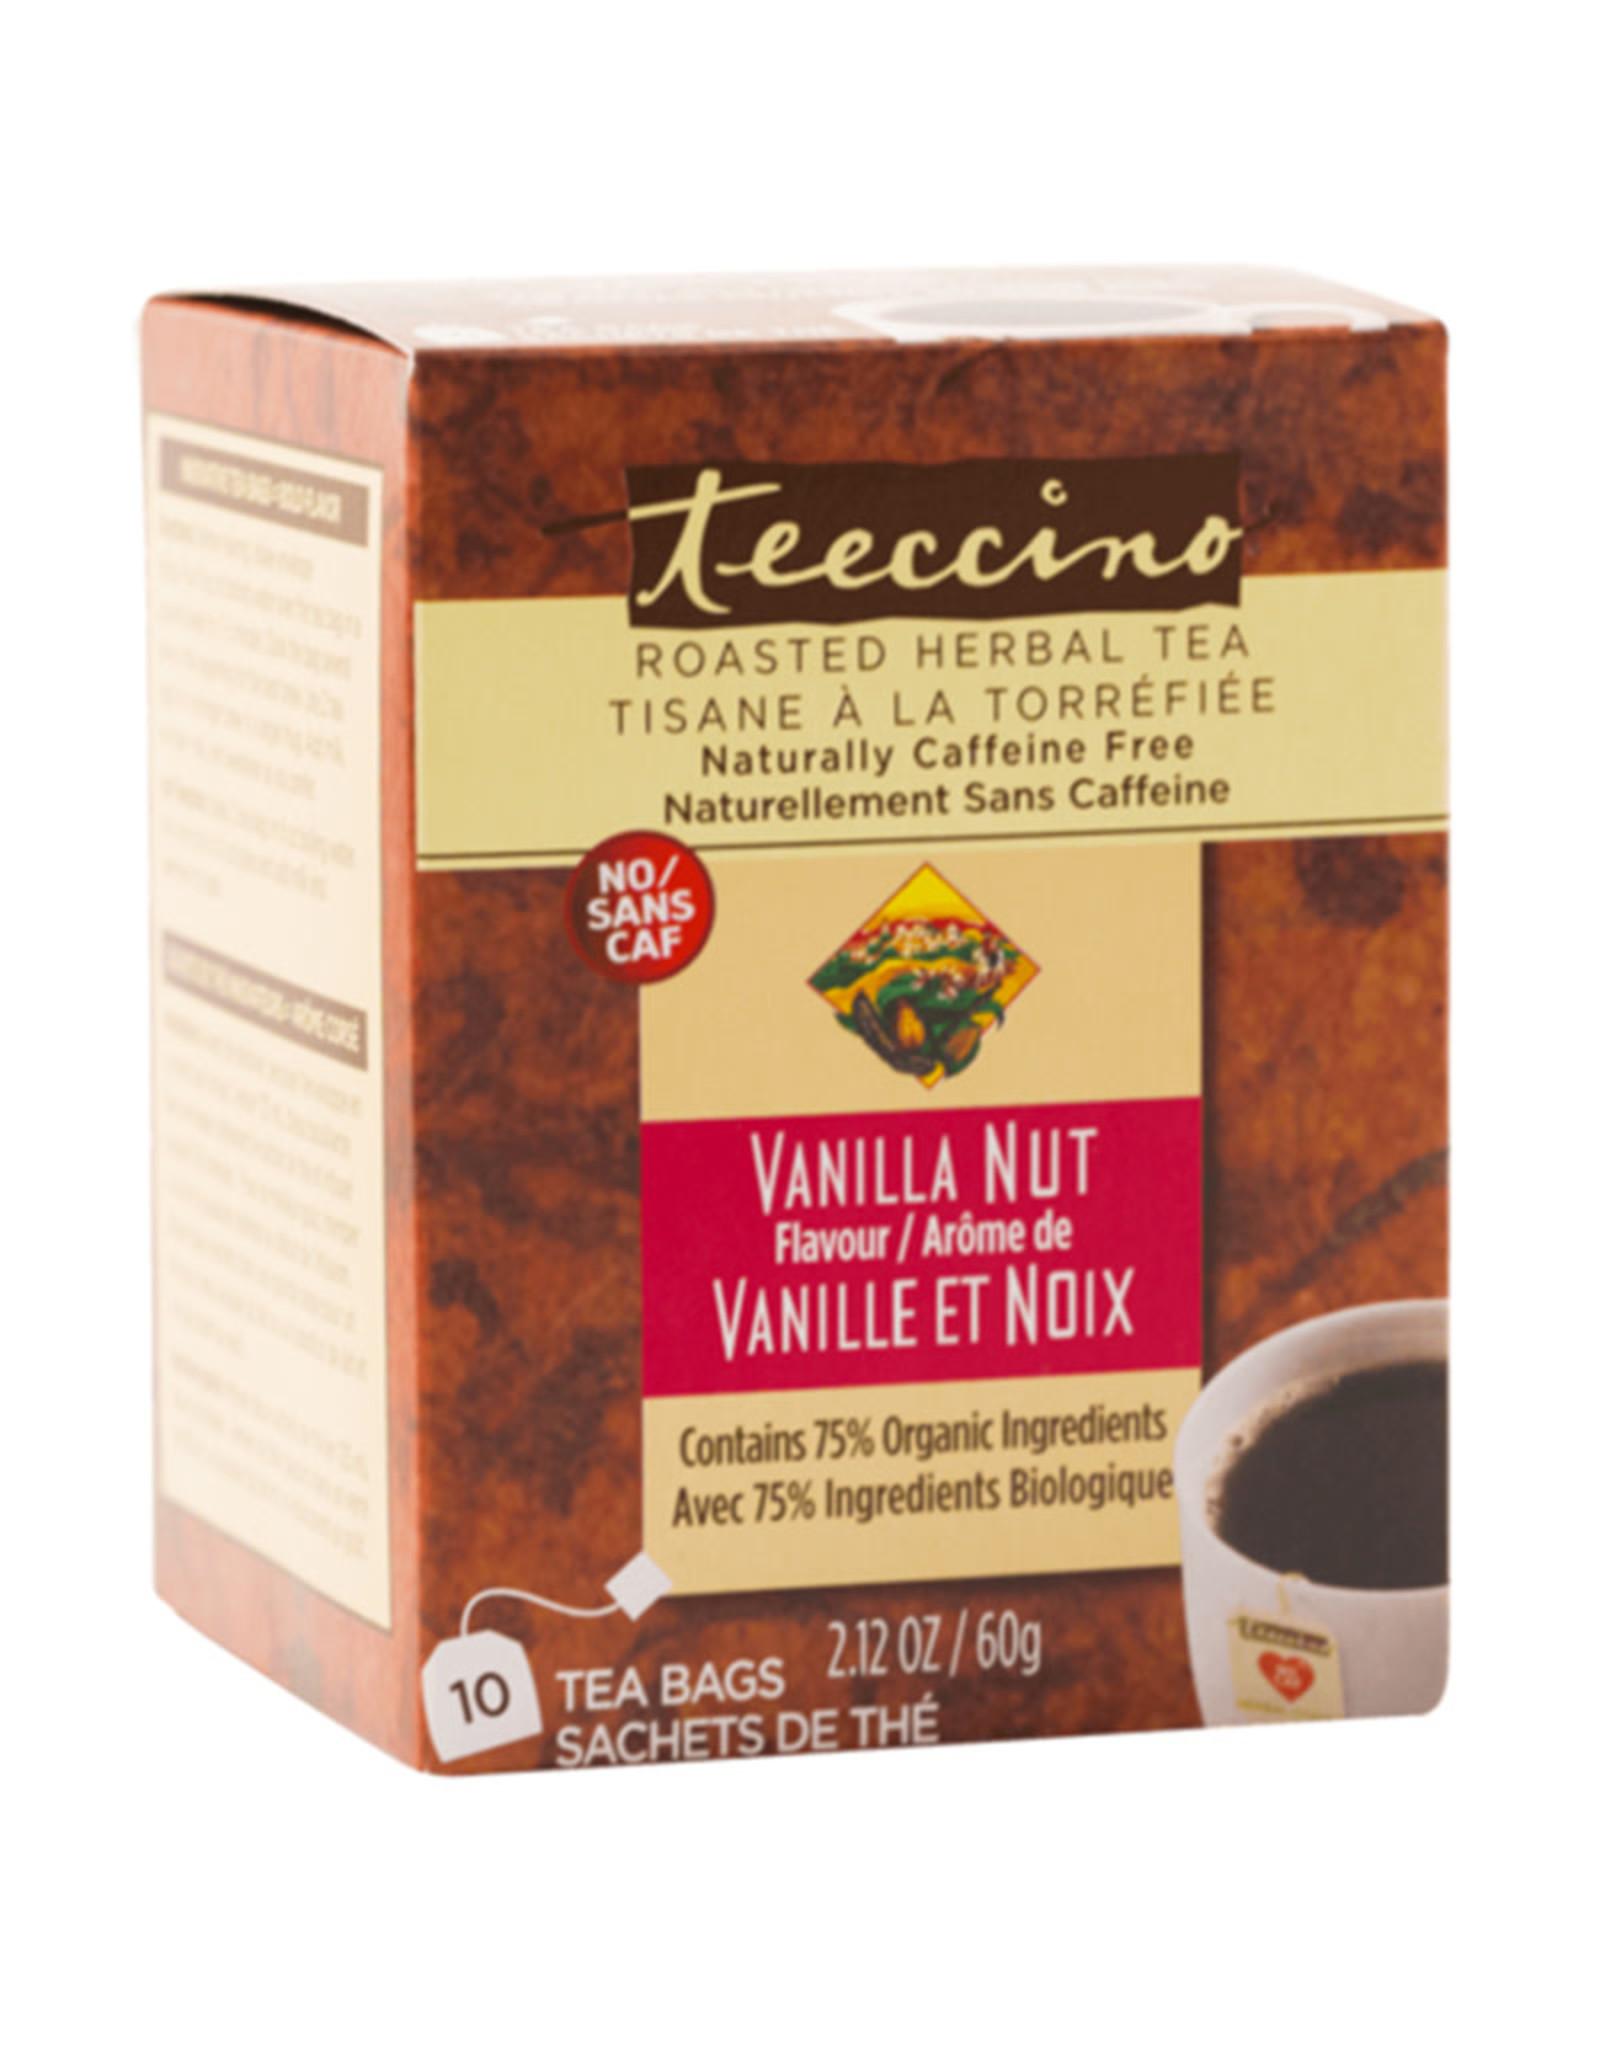 Teeccino Teeccino - Herbal Tea, Vanilla Nut (10 Bags)